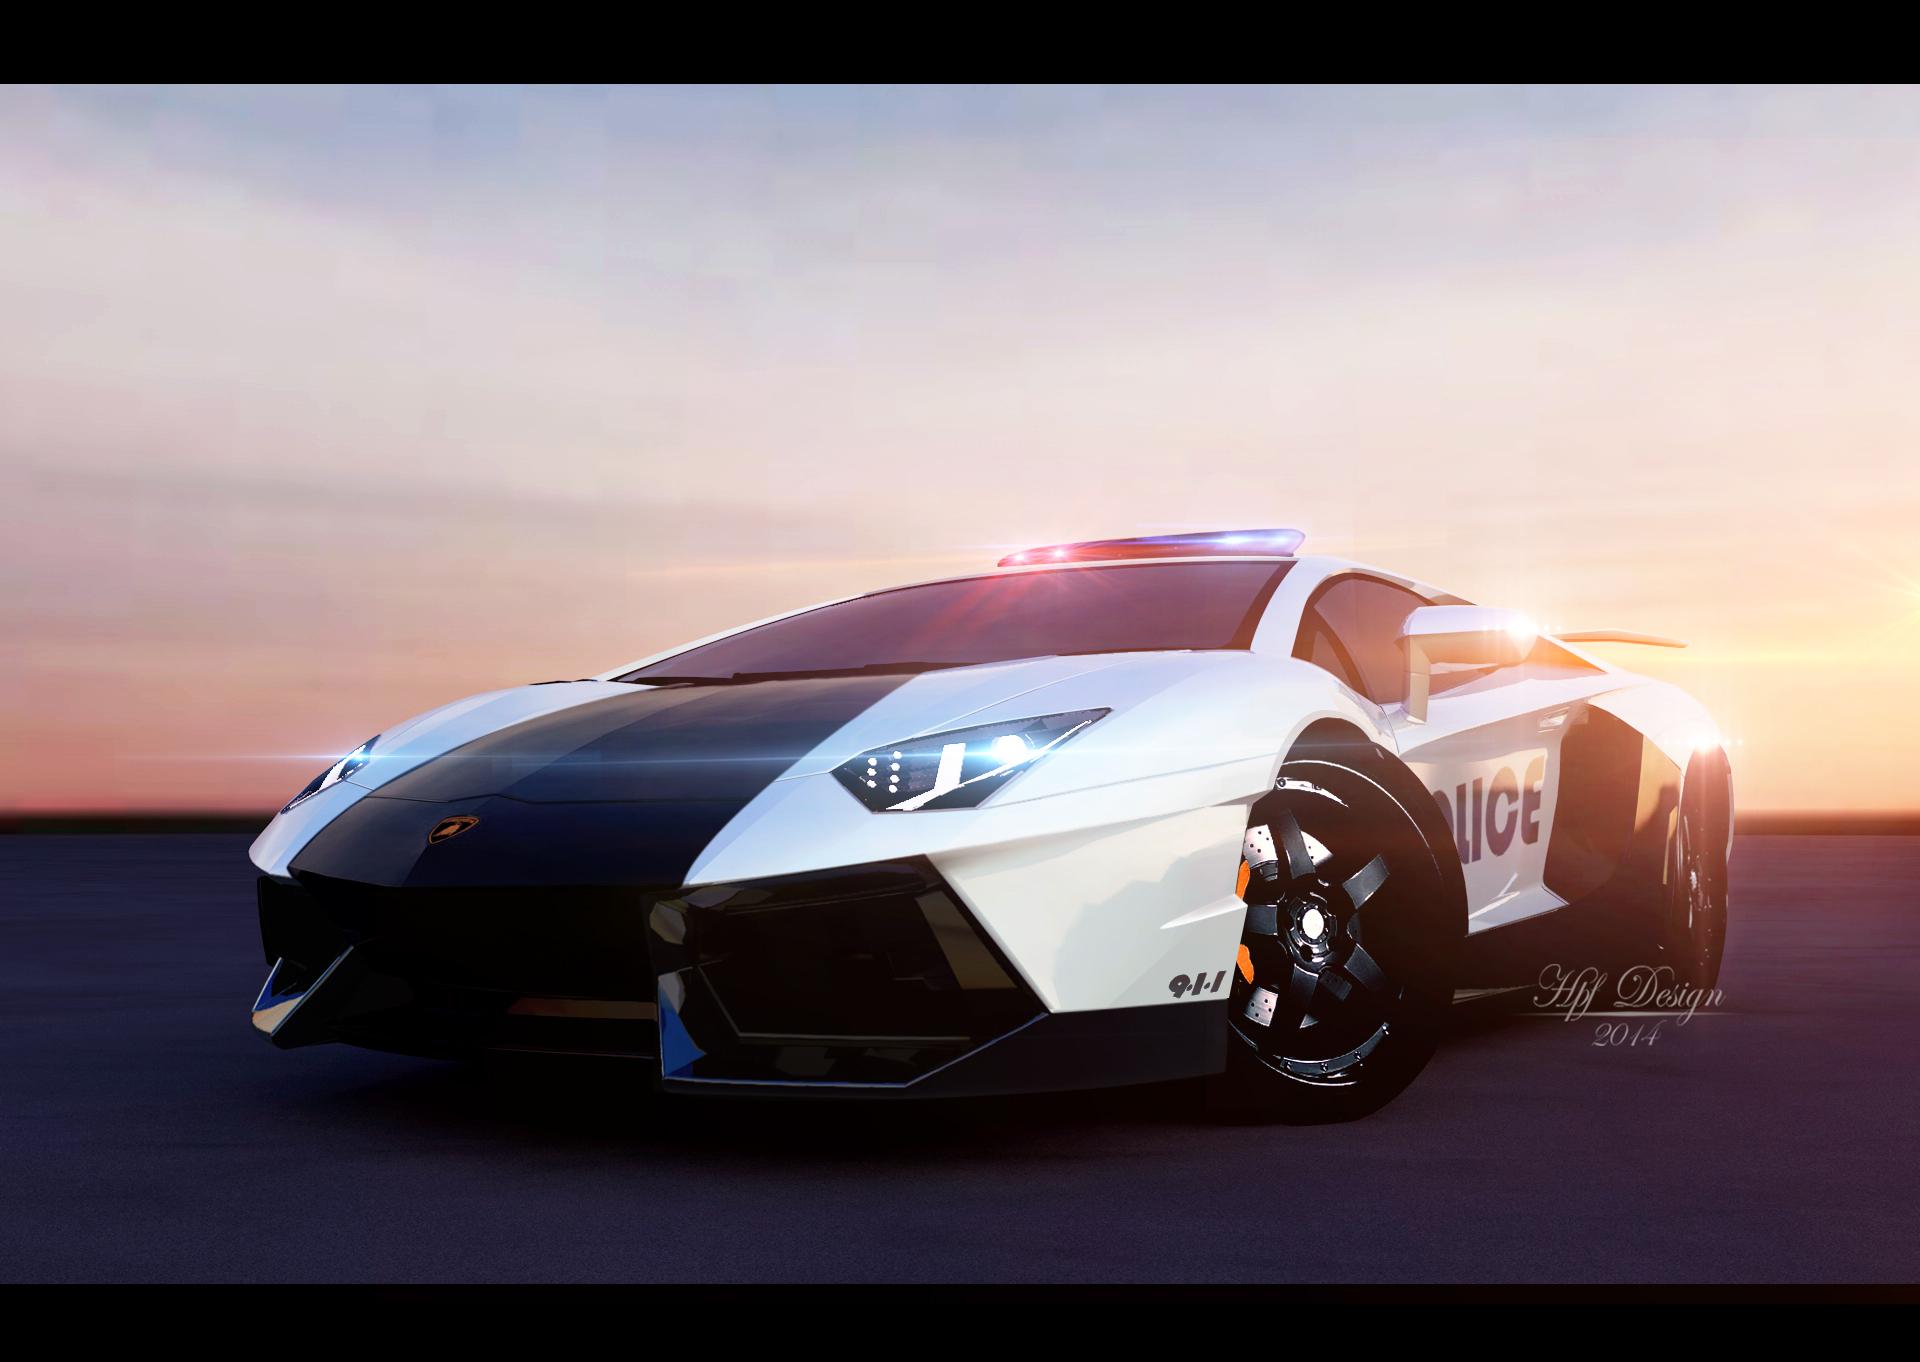 hpf design u0026 39 s profile  u203a autemo com  u203a automotive design studio